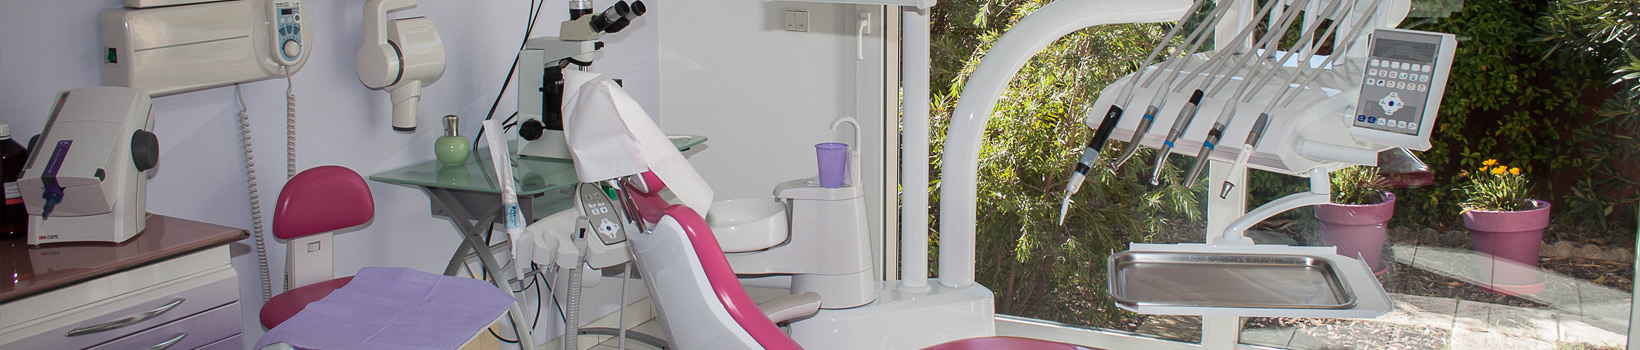 dentiste monteux Ortega